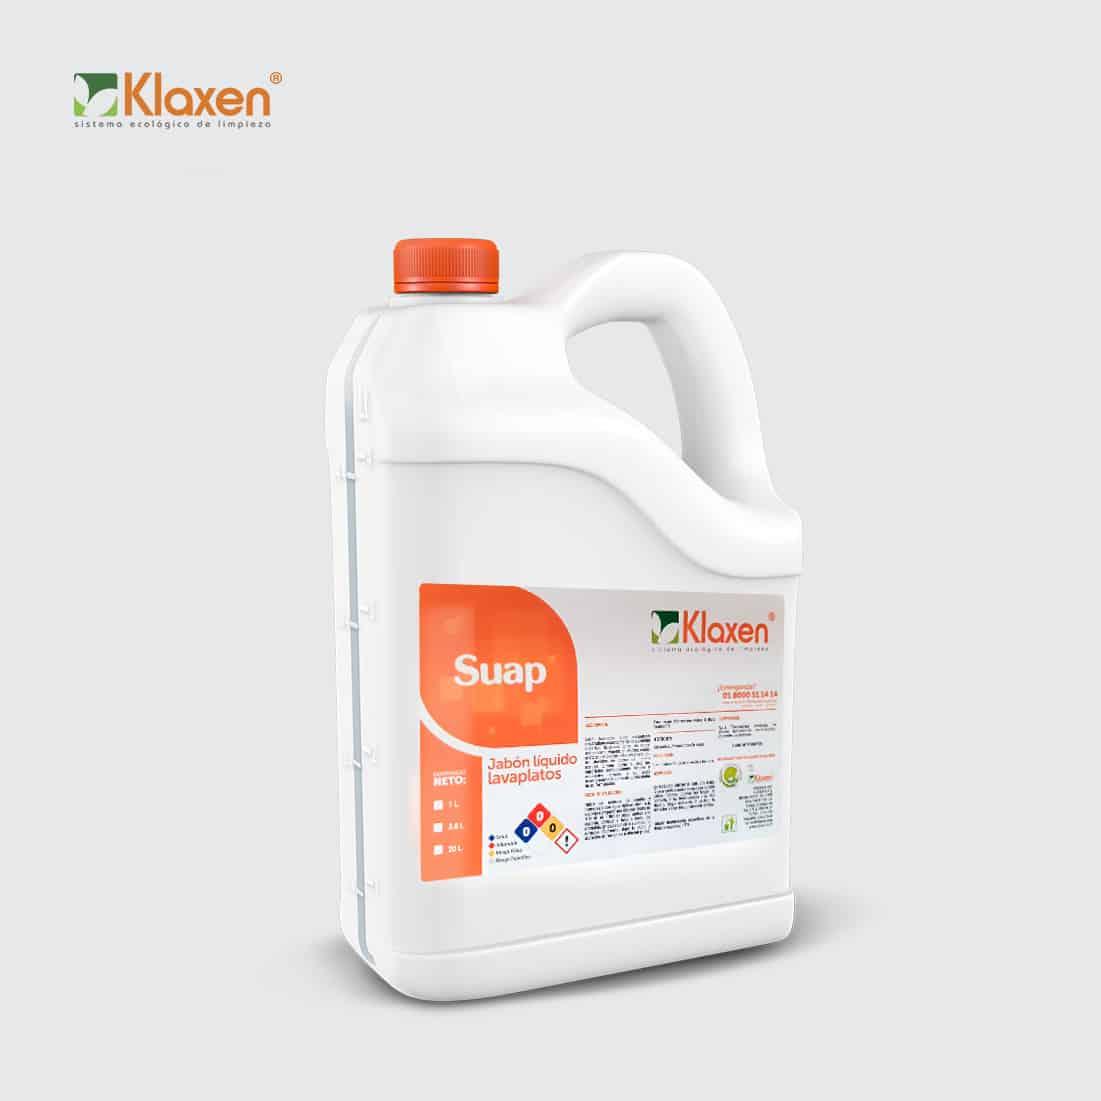 Suap: Jabón líquido para platos – 3.8 litros